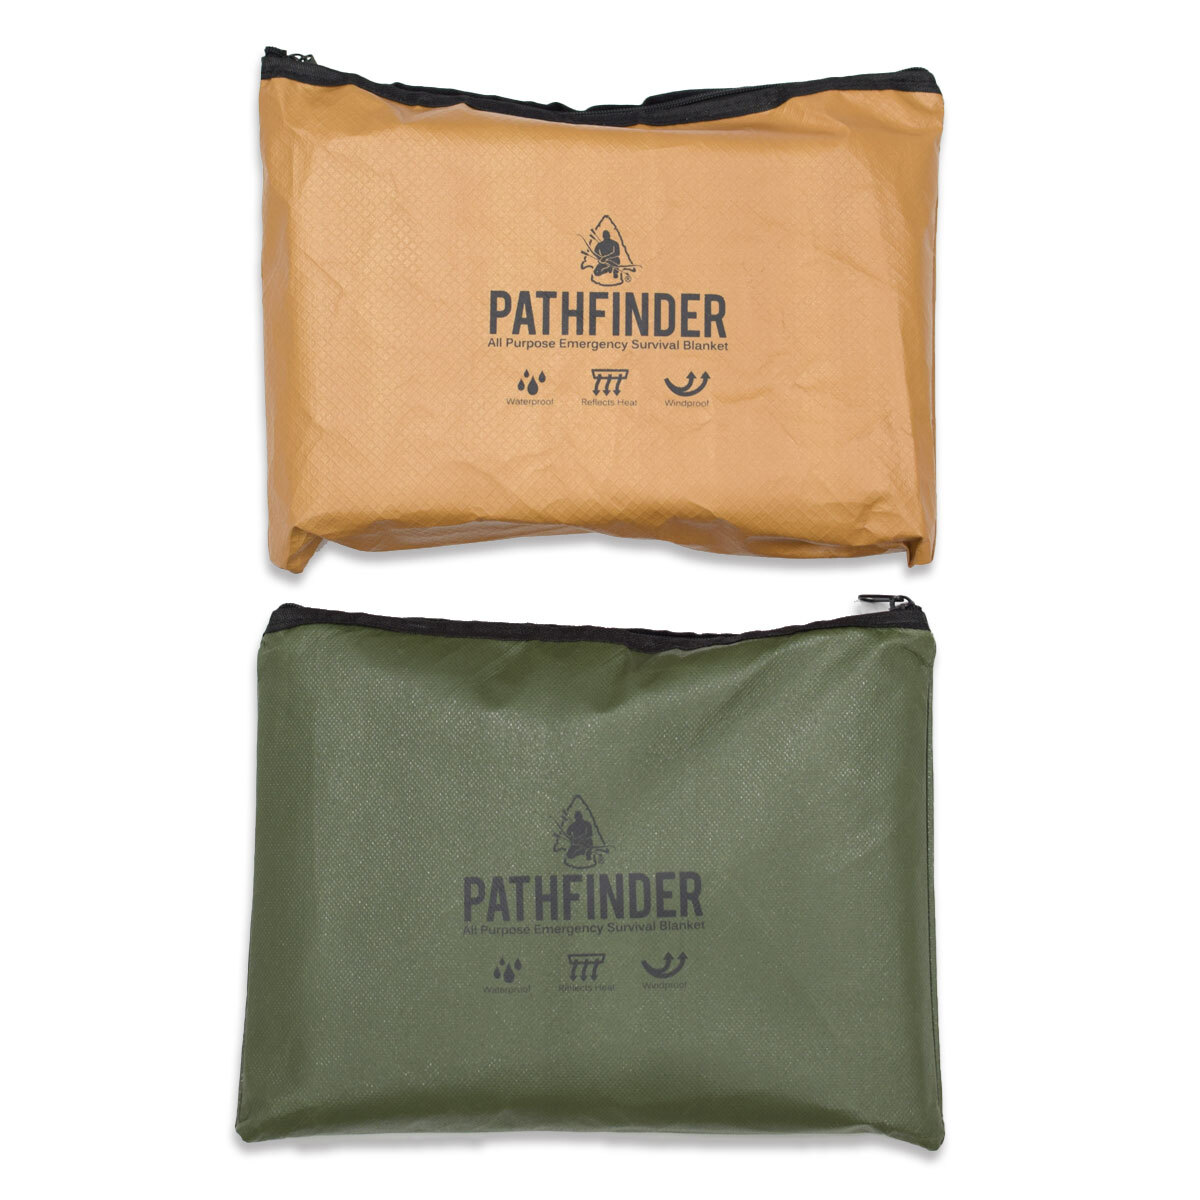 PATHFINDER Survival Blanket パスファインダー サバイバル ブランケット